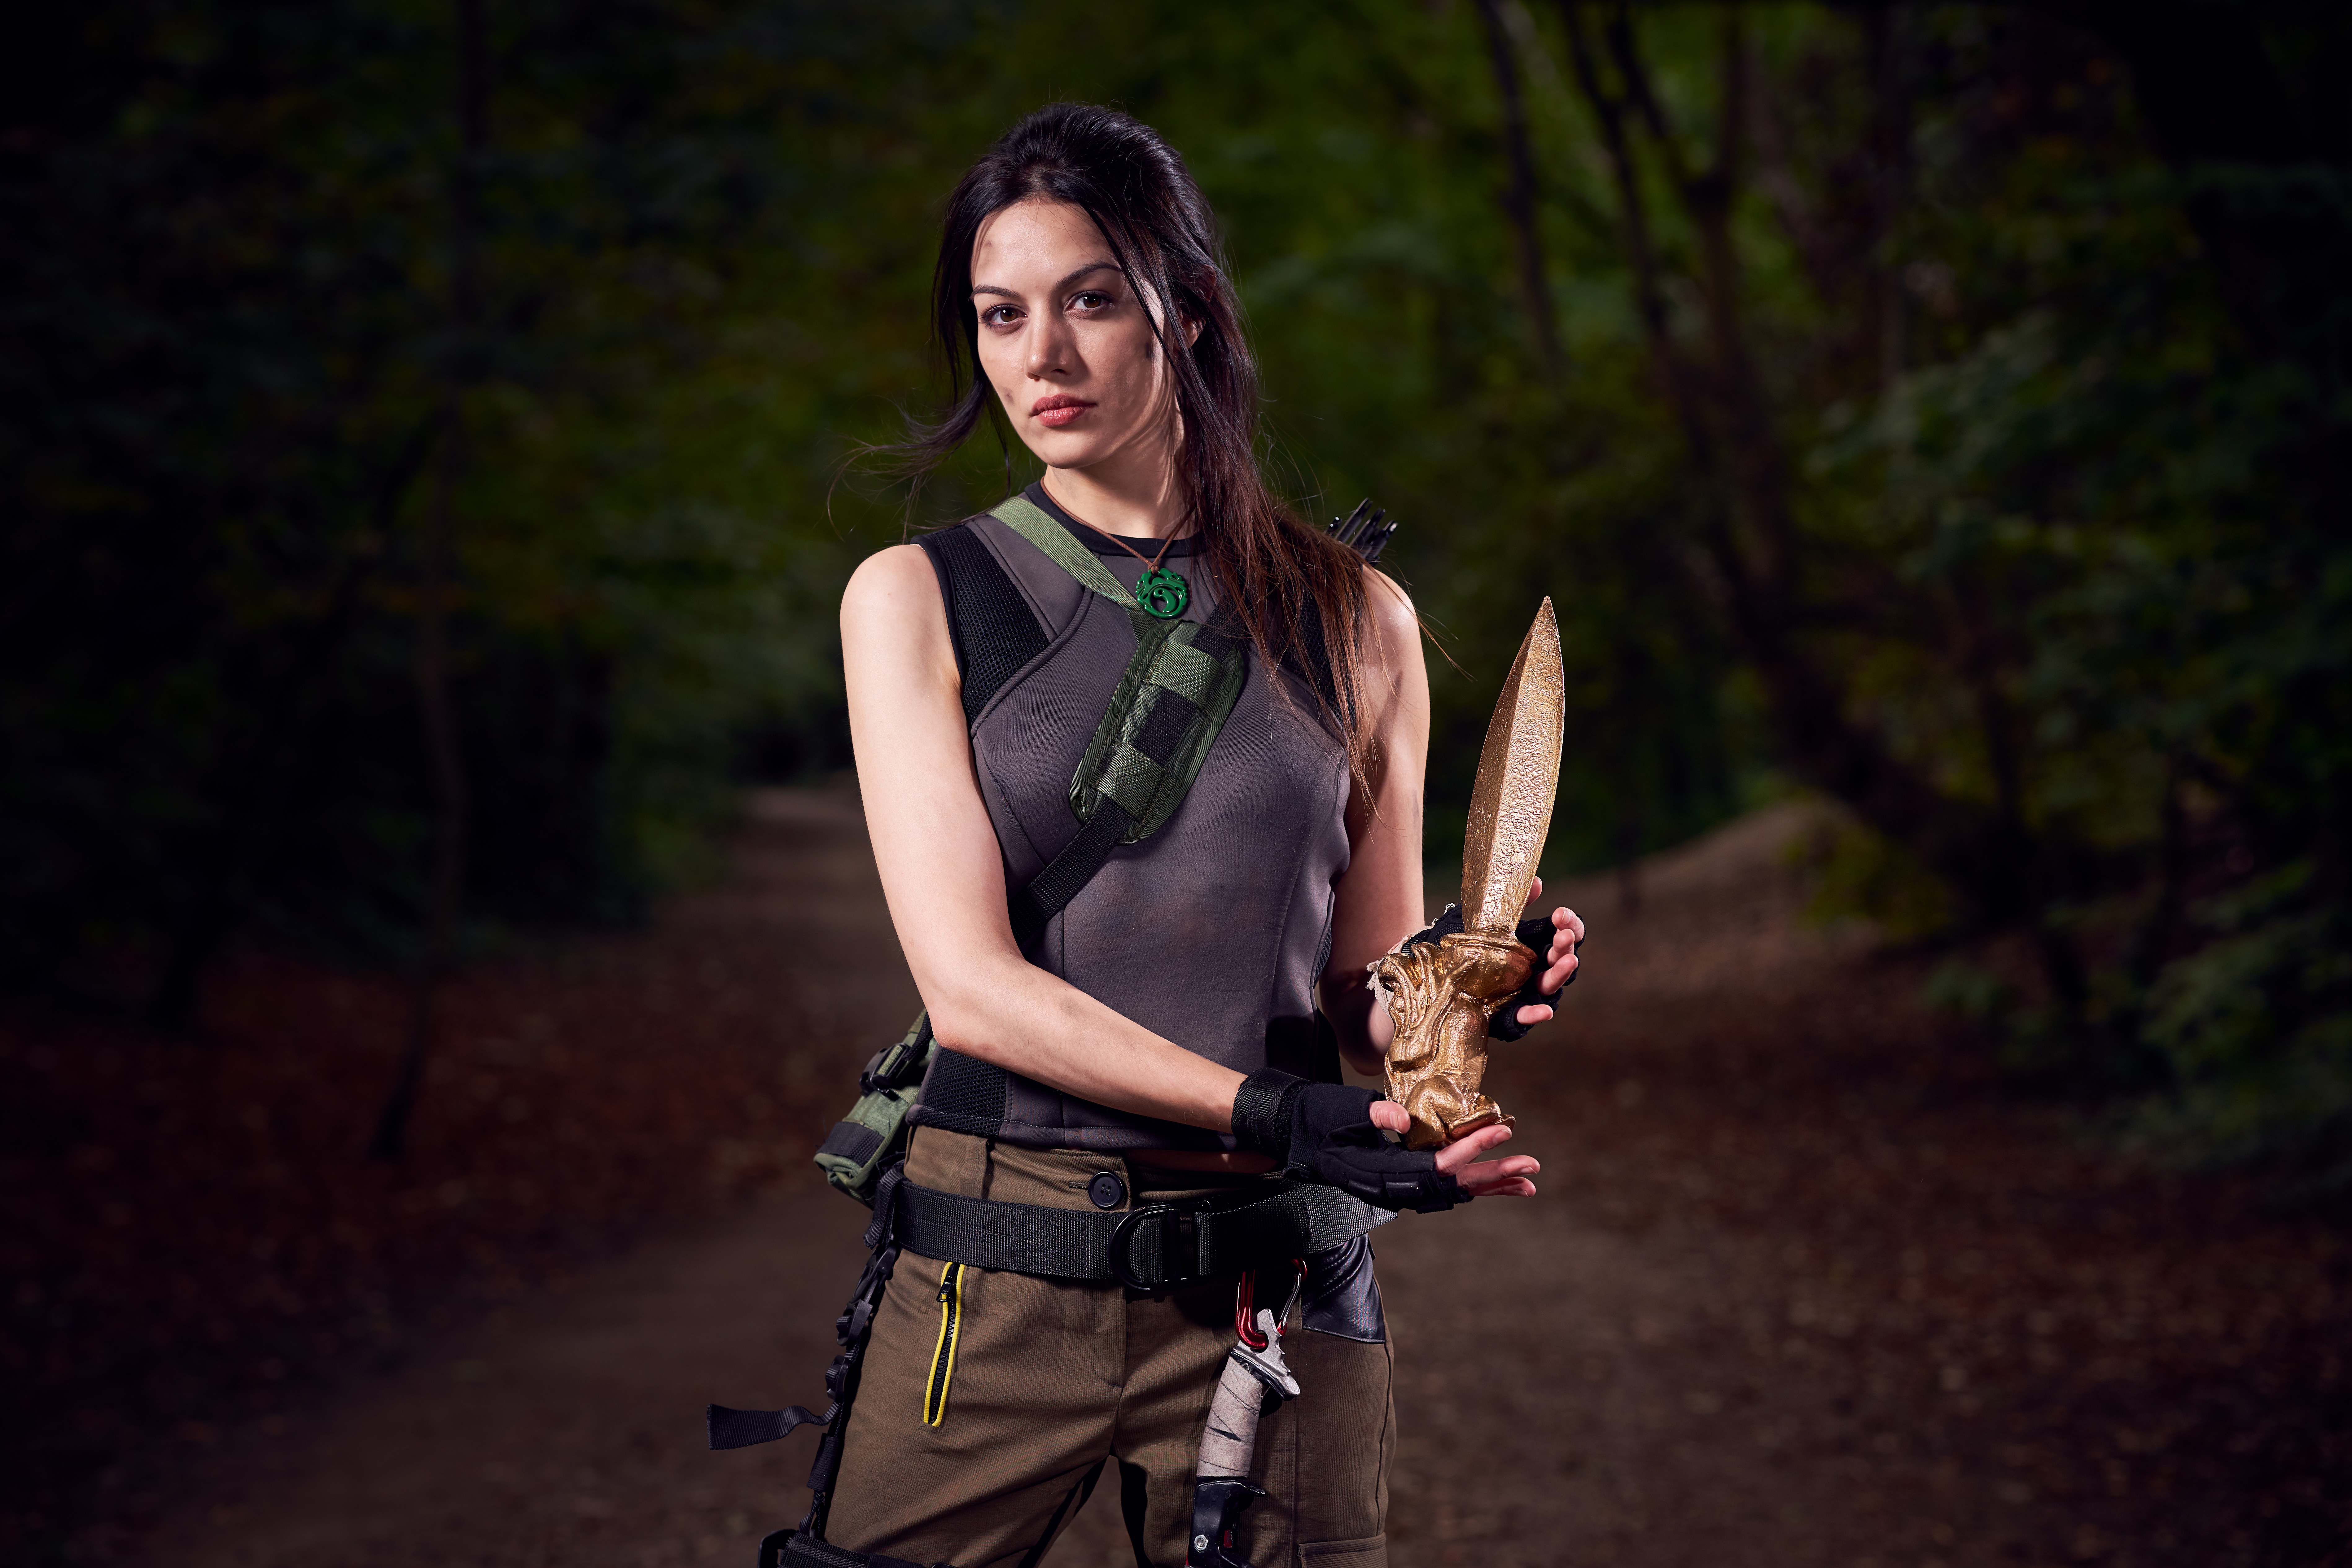 lara shadow of the tomb raider cosplay 1575664042 - Lara Shadow Of The Tomb Raider Cosplay -